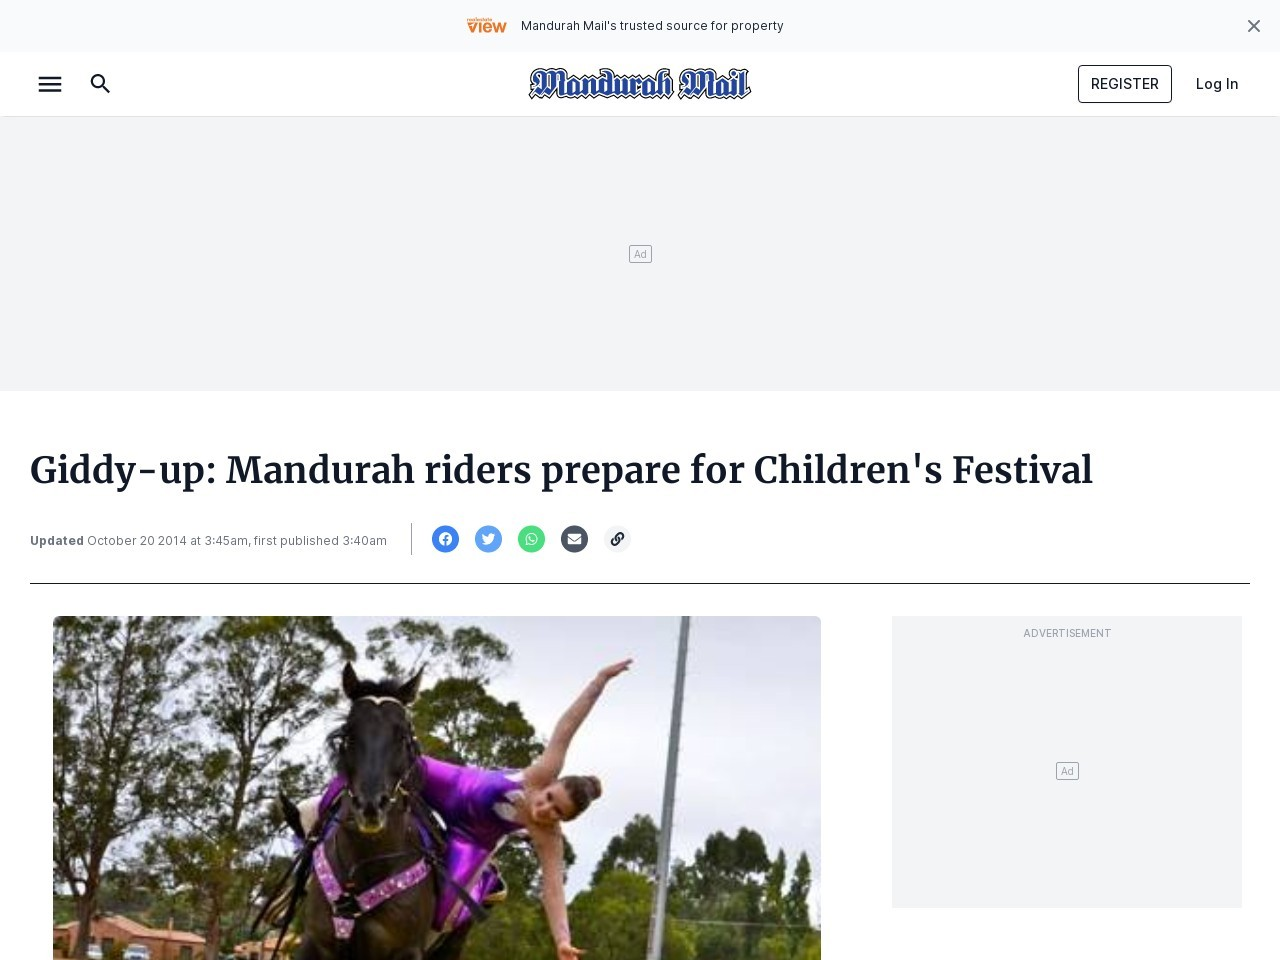 Giddy-up: Peel riders prepare for Mandurah Children's Festival